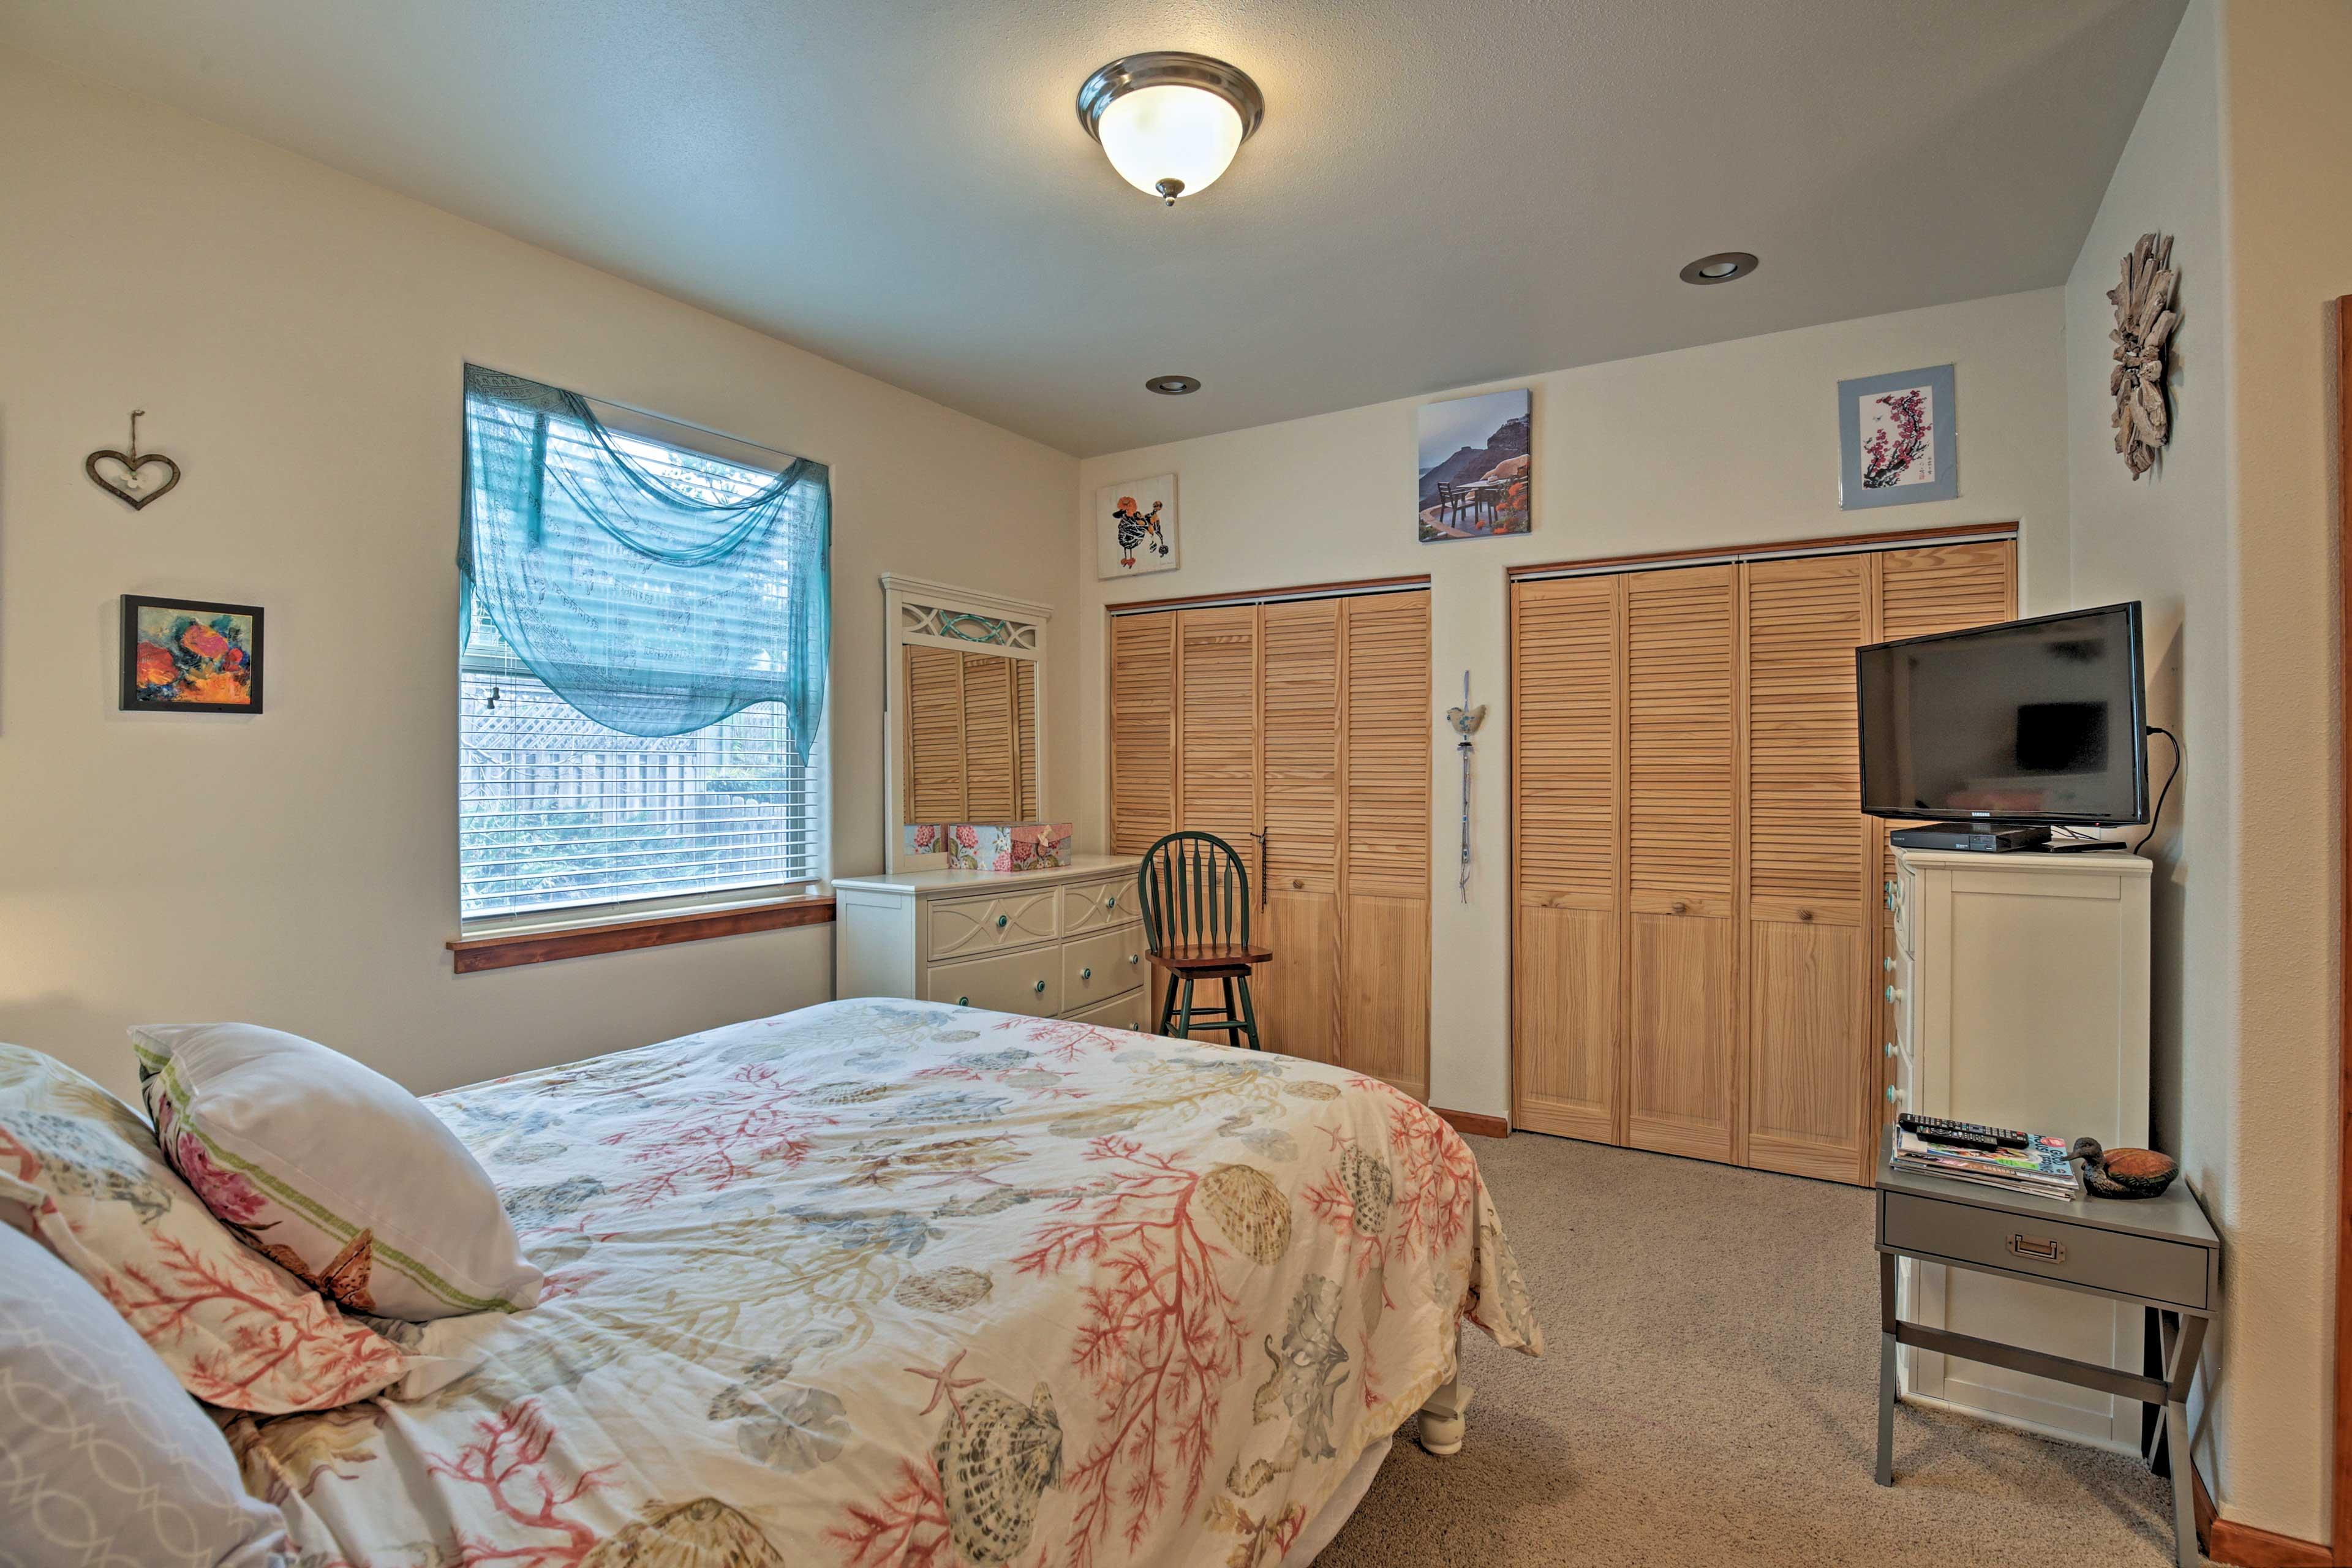 Both rooms boast comfortable queen beds.